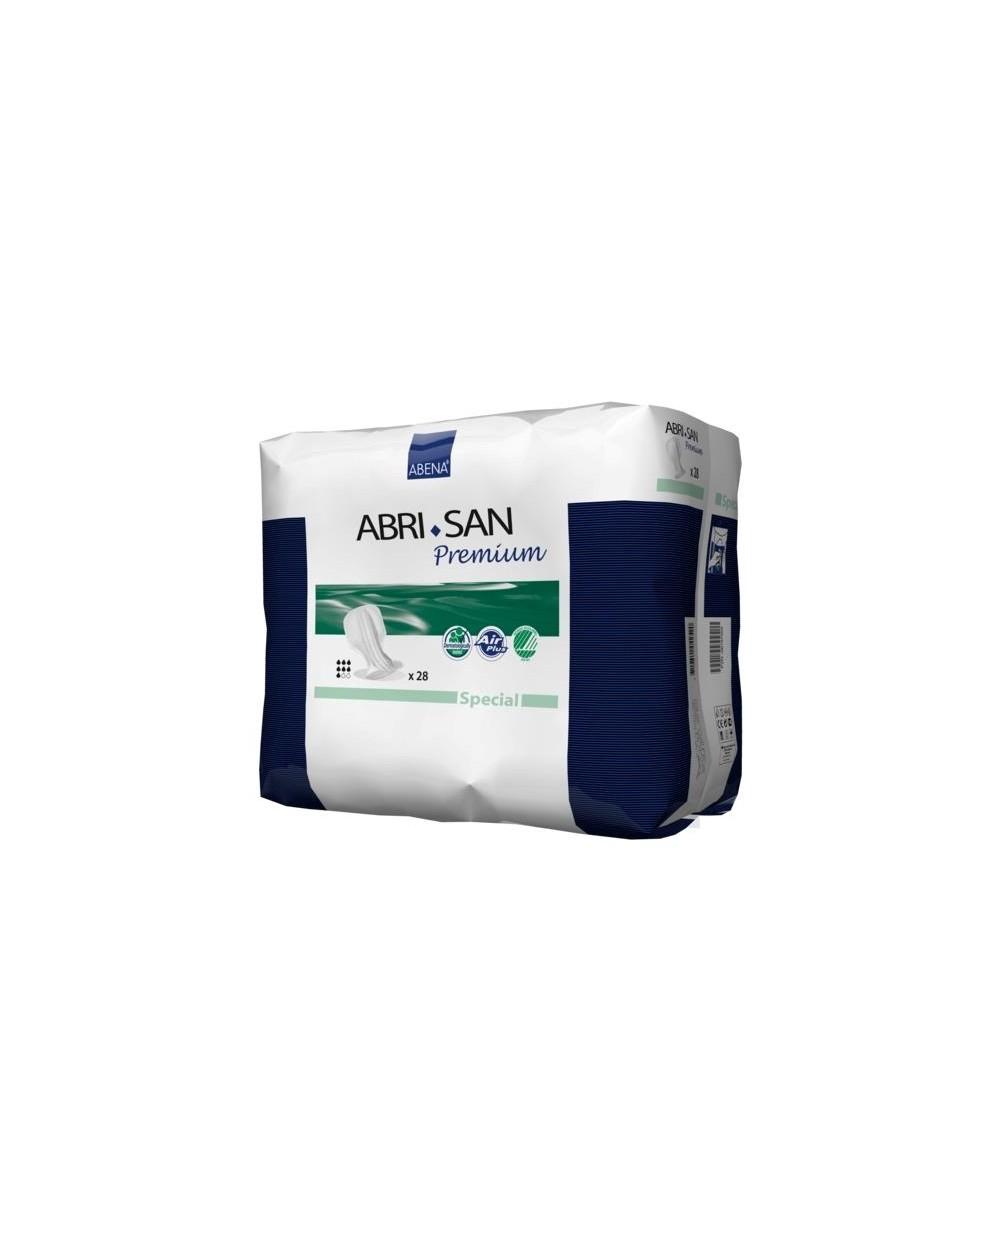 ABENA Abri-San SPECIAL - 28 protections